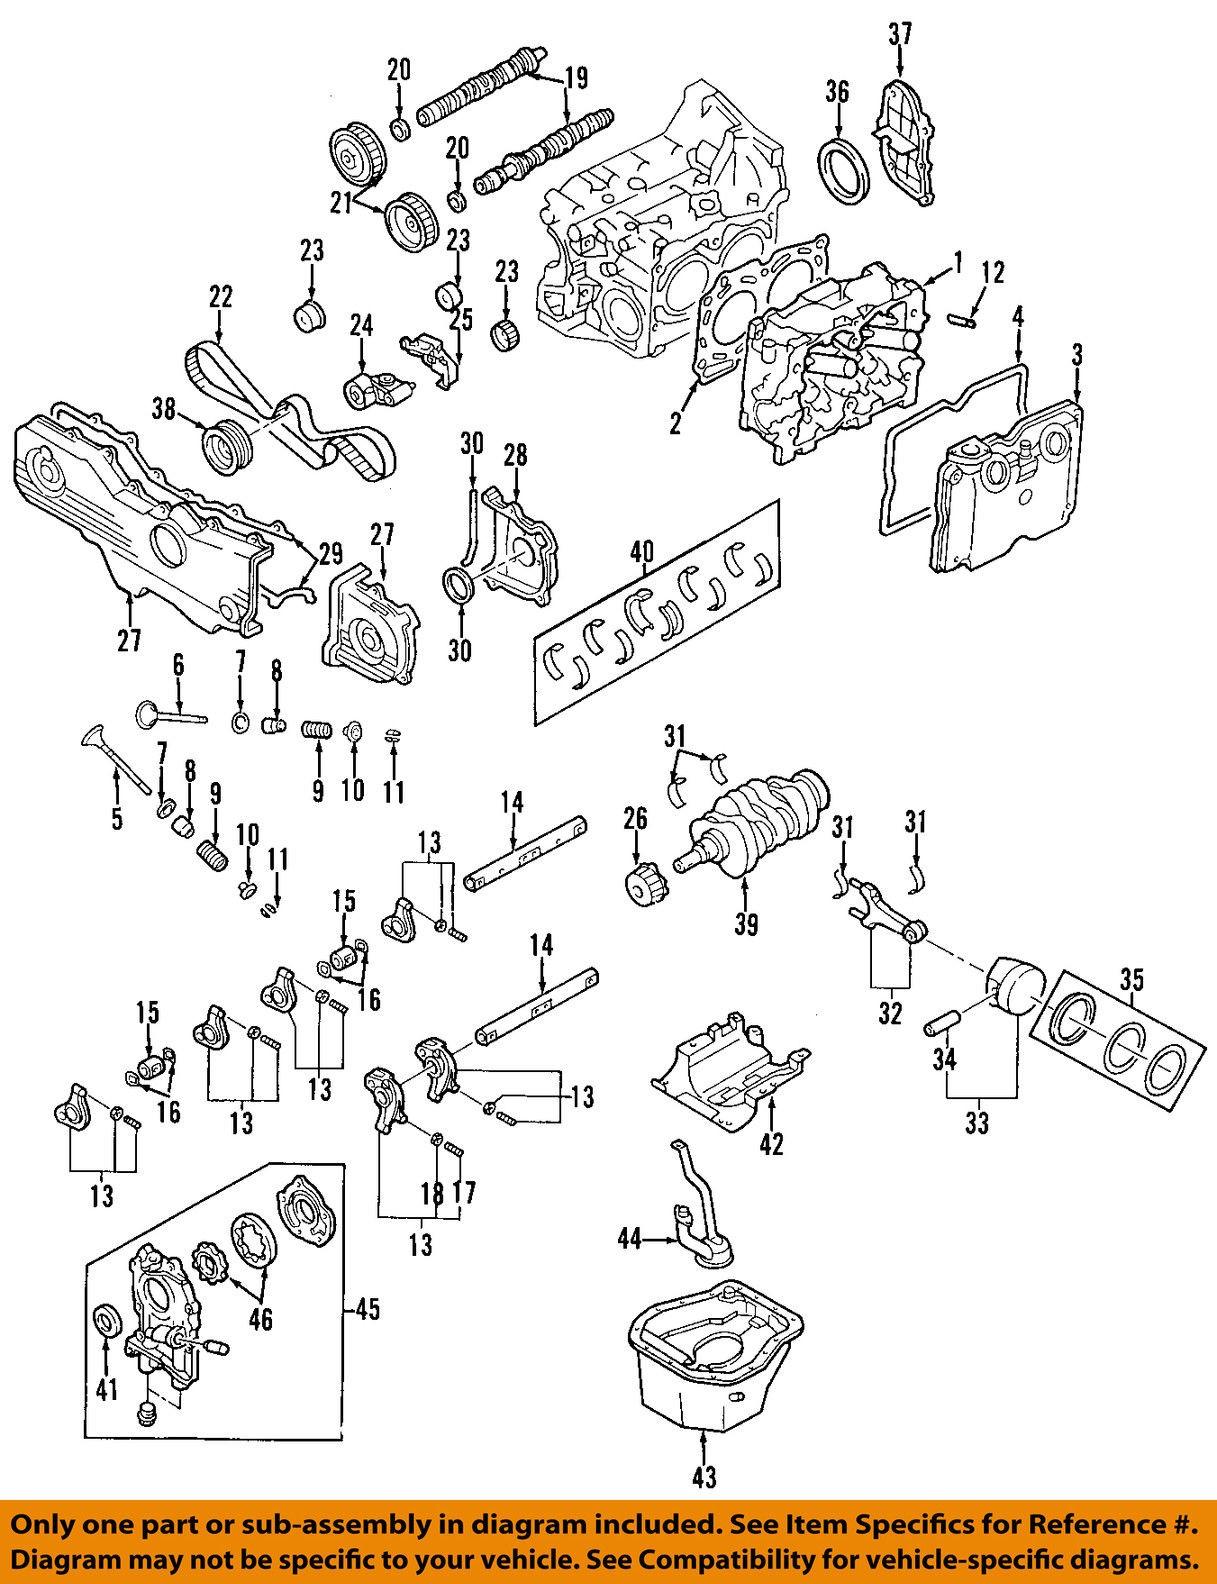 Car Engine Diagram Piston Subaru Oem 04 14 Impreza Engine Piston Ring Ab340 $150 38 Of Car Engine Diagram Piston